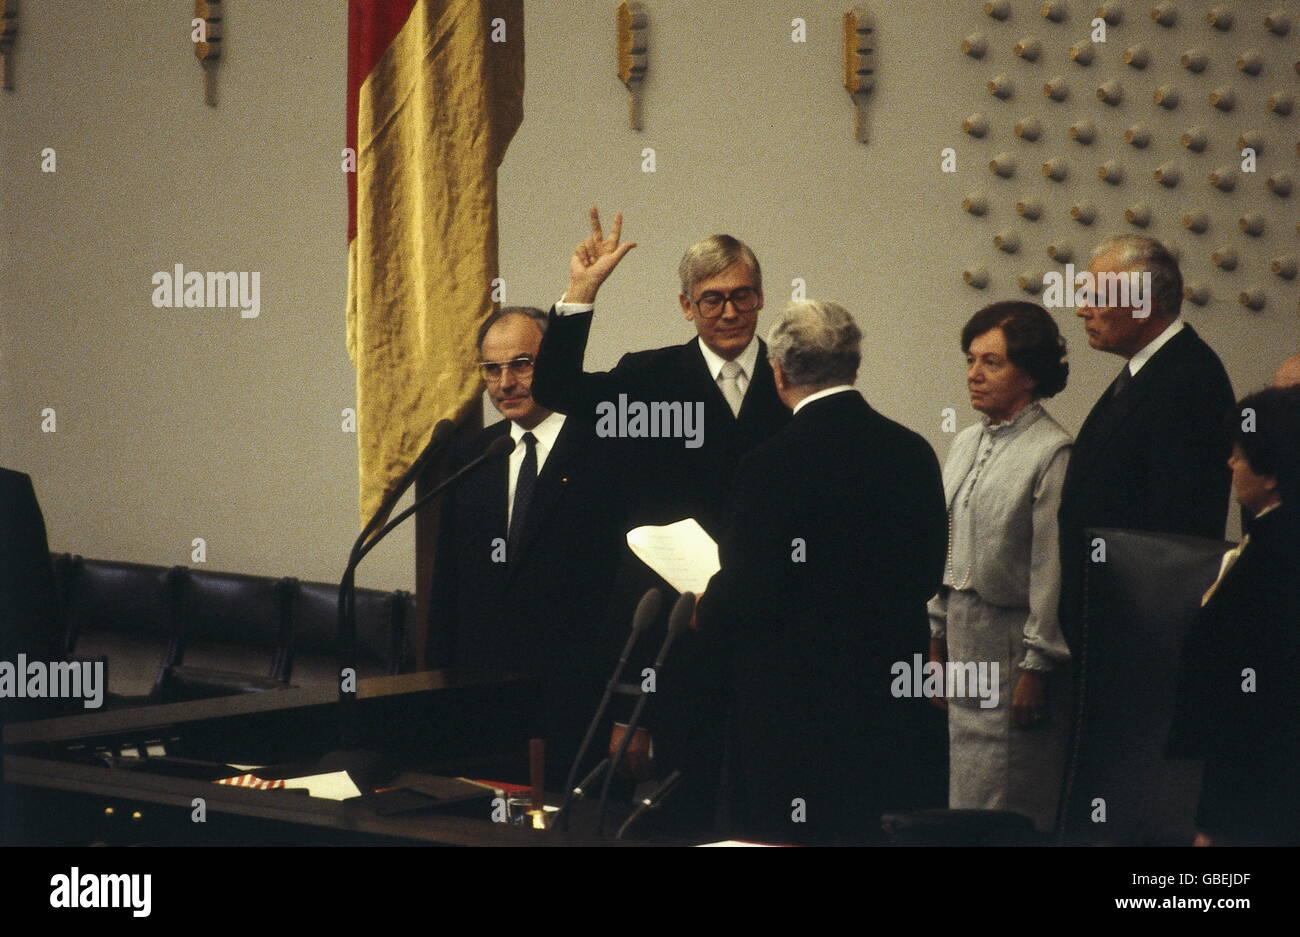 Geography / Travel, Germany, Politics, German Bundestag, Swearing In Of The  14th Cabinet, Christian Schwarz Schilling, Bonn, 4.10.1982